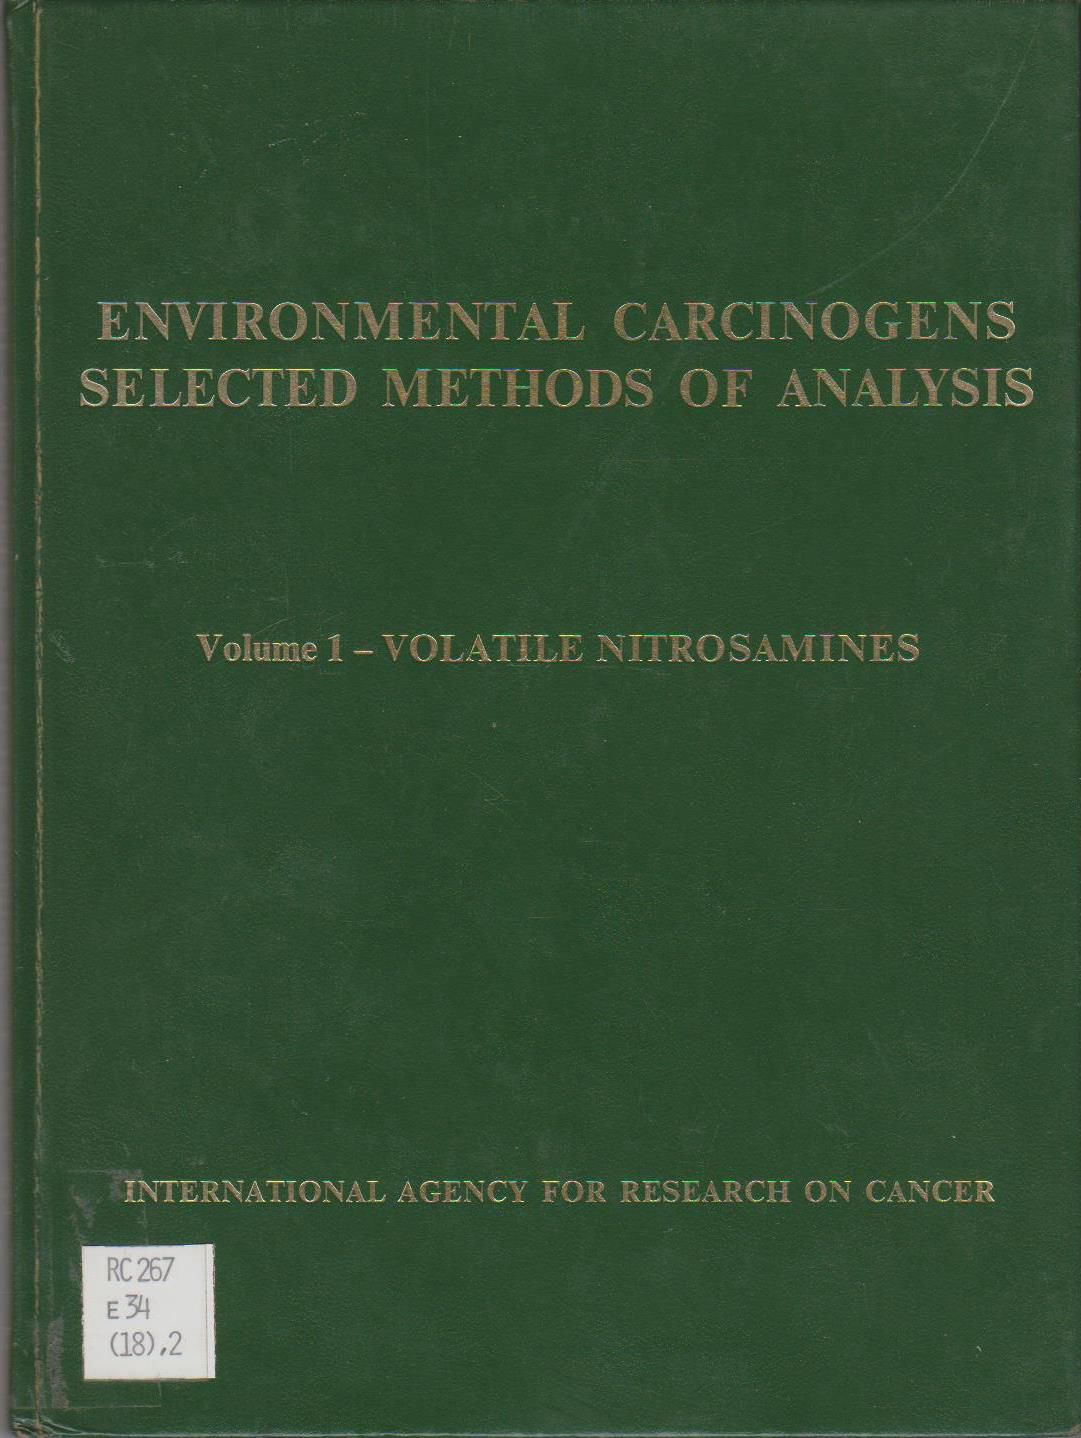 Environmental Carcinogens: Analysis of Volatile Nitrosamines in Food v. 1: Selected Methods of Analysis